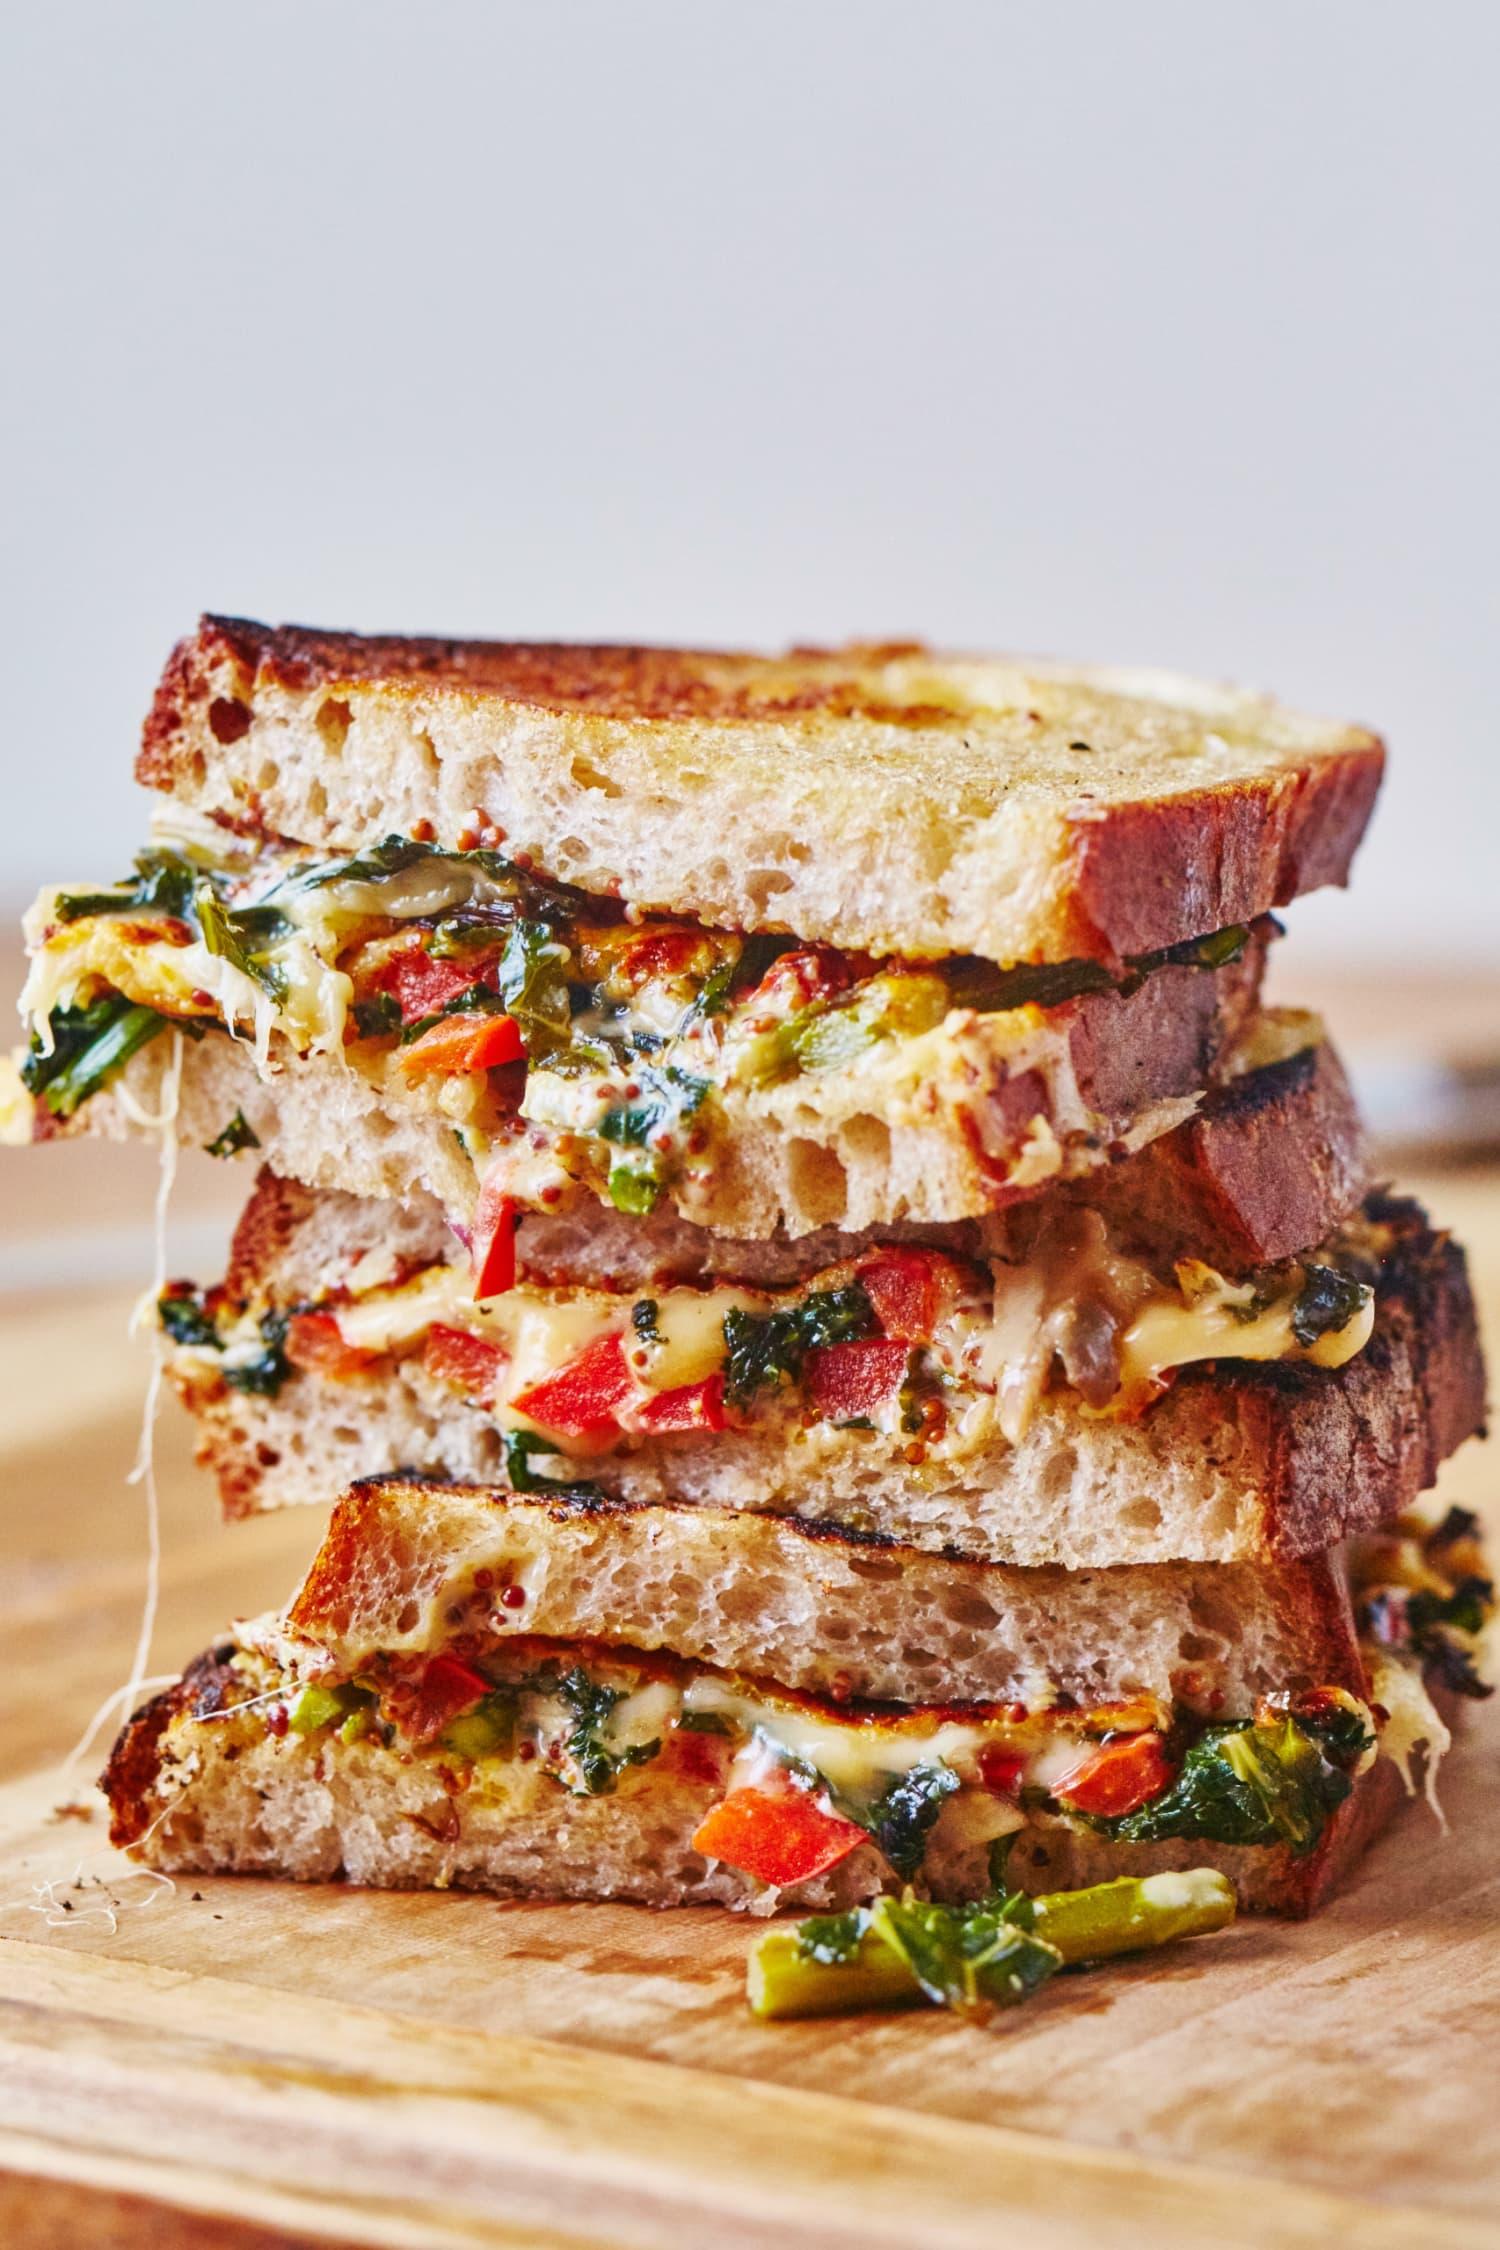 Sandwich Recipes cover image